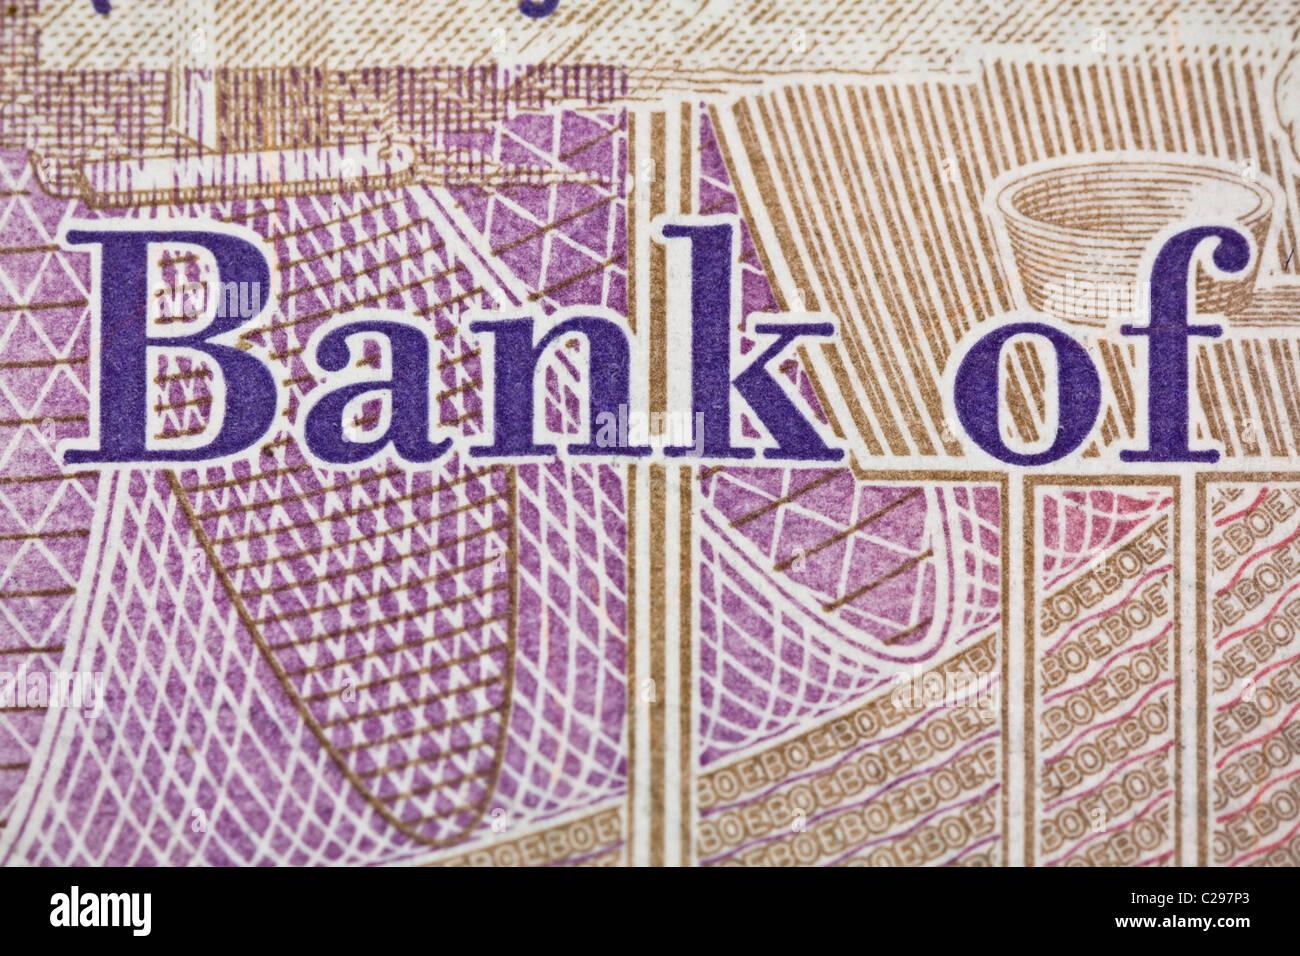 Detail of twenty pound note - Stock Image